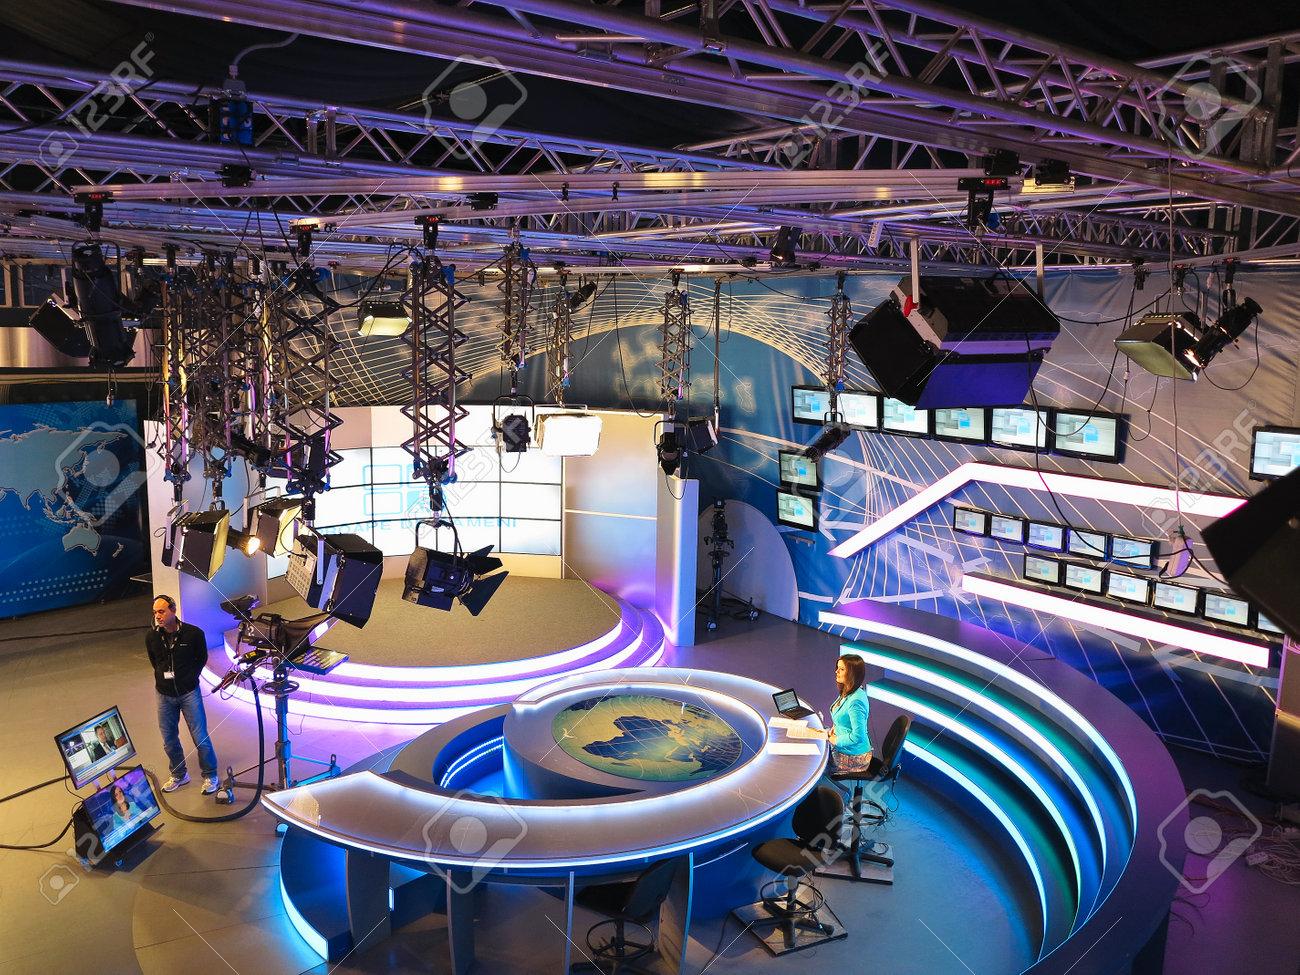 "05.04.2015, MOLDOVA, ""Publika TV"" NEWS studio with light equipment ready for recordind release. - 51840664"